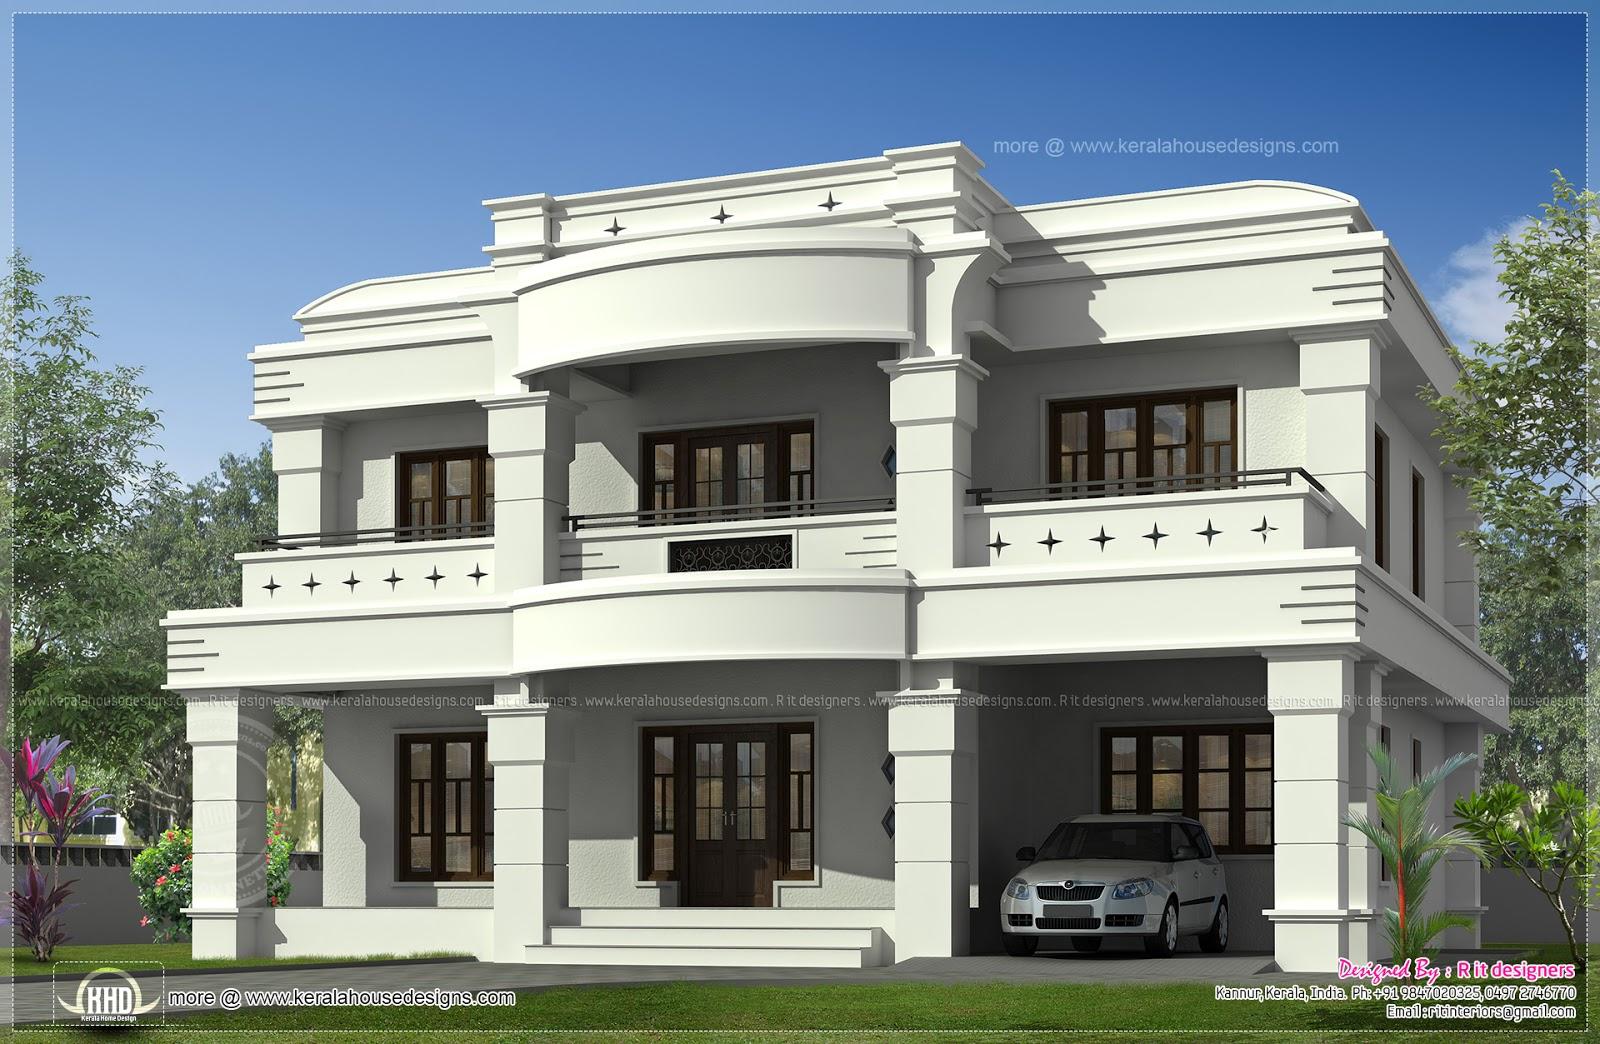 Indian homes exterior designs - Home design